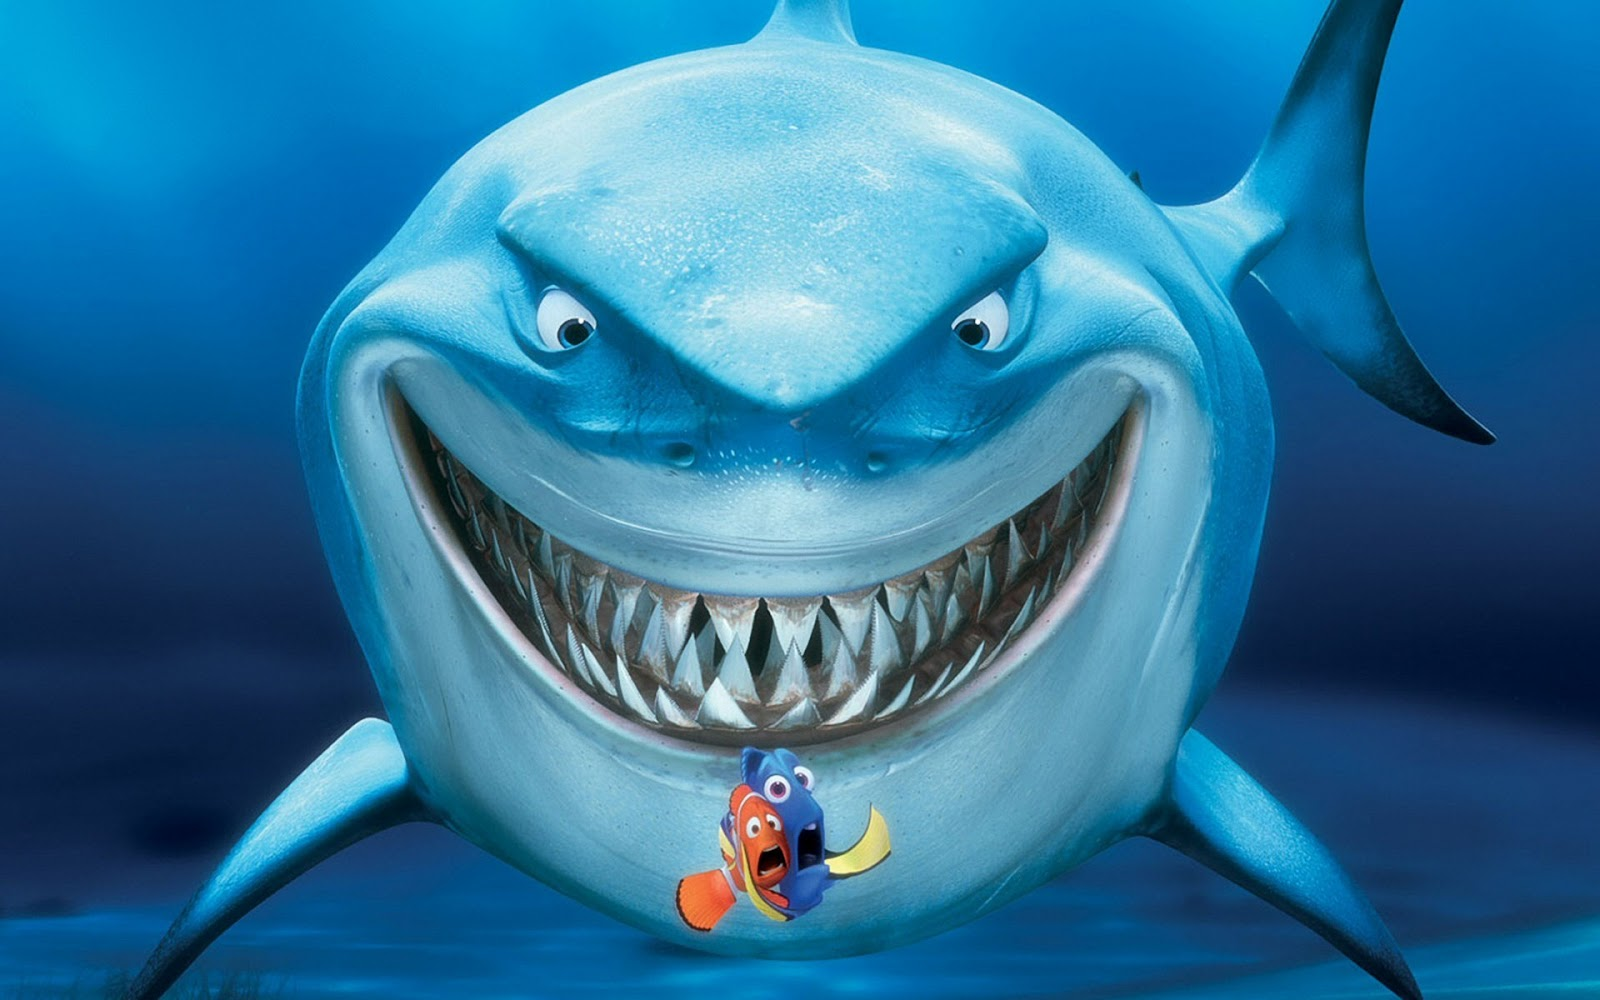 Shark hd wallpapers   Movies Songs Lyrics